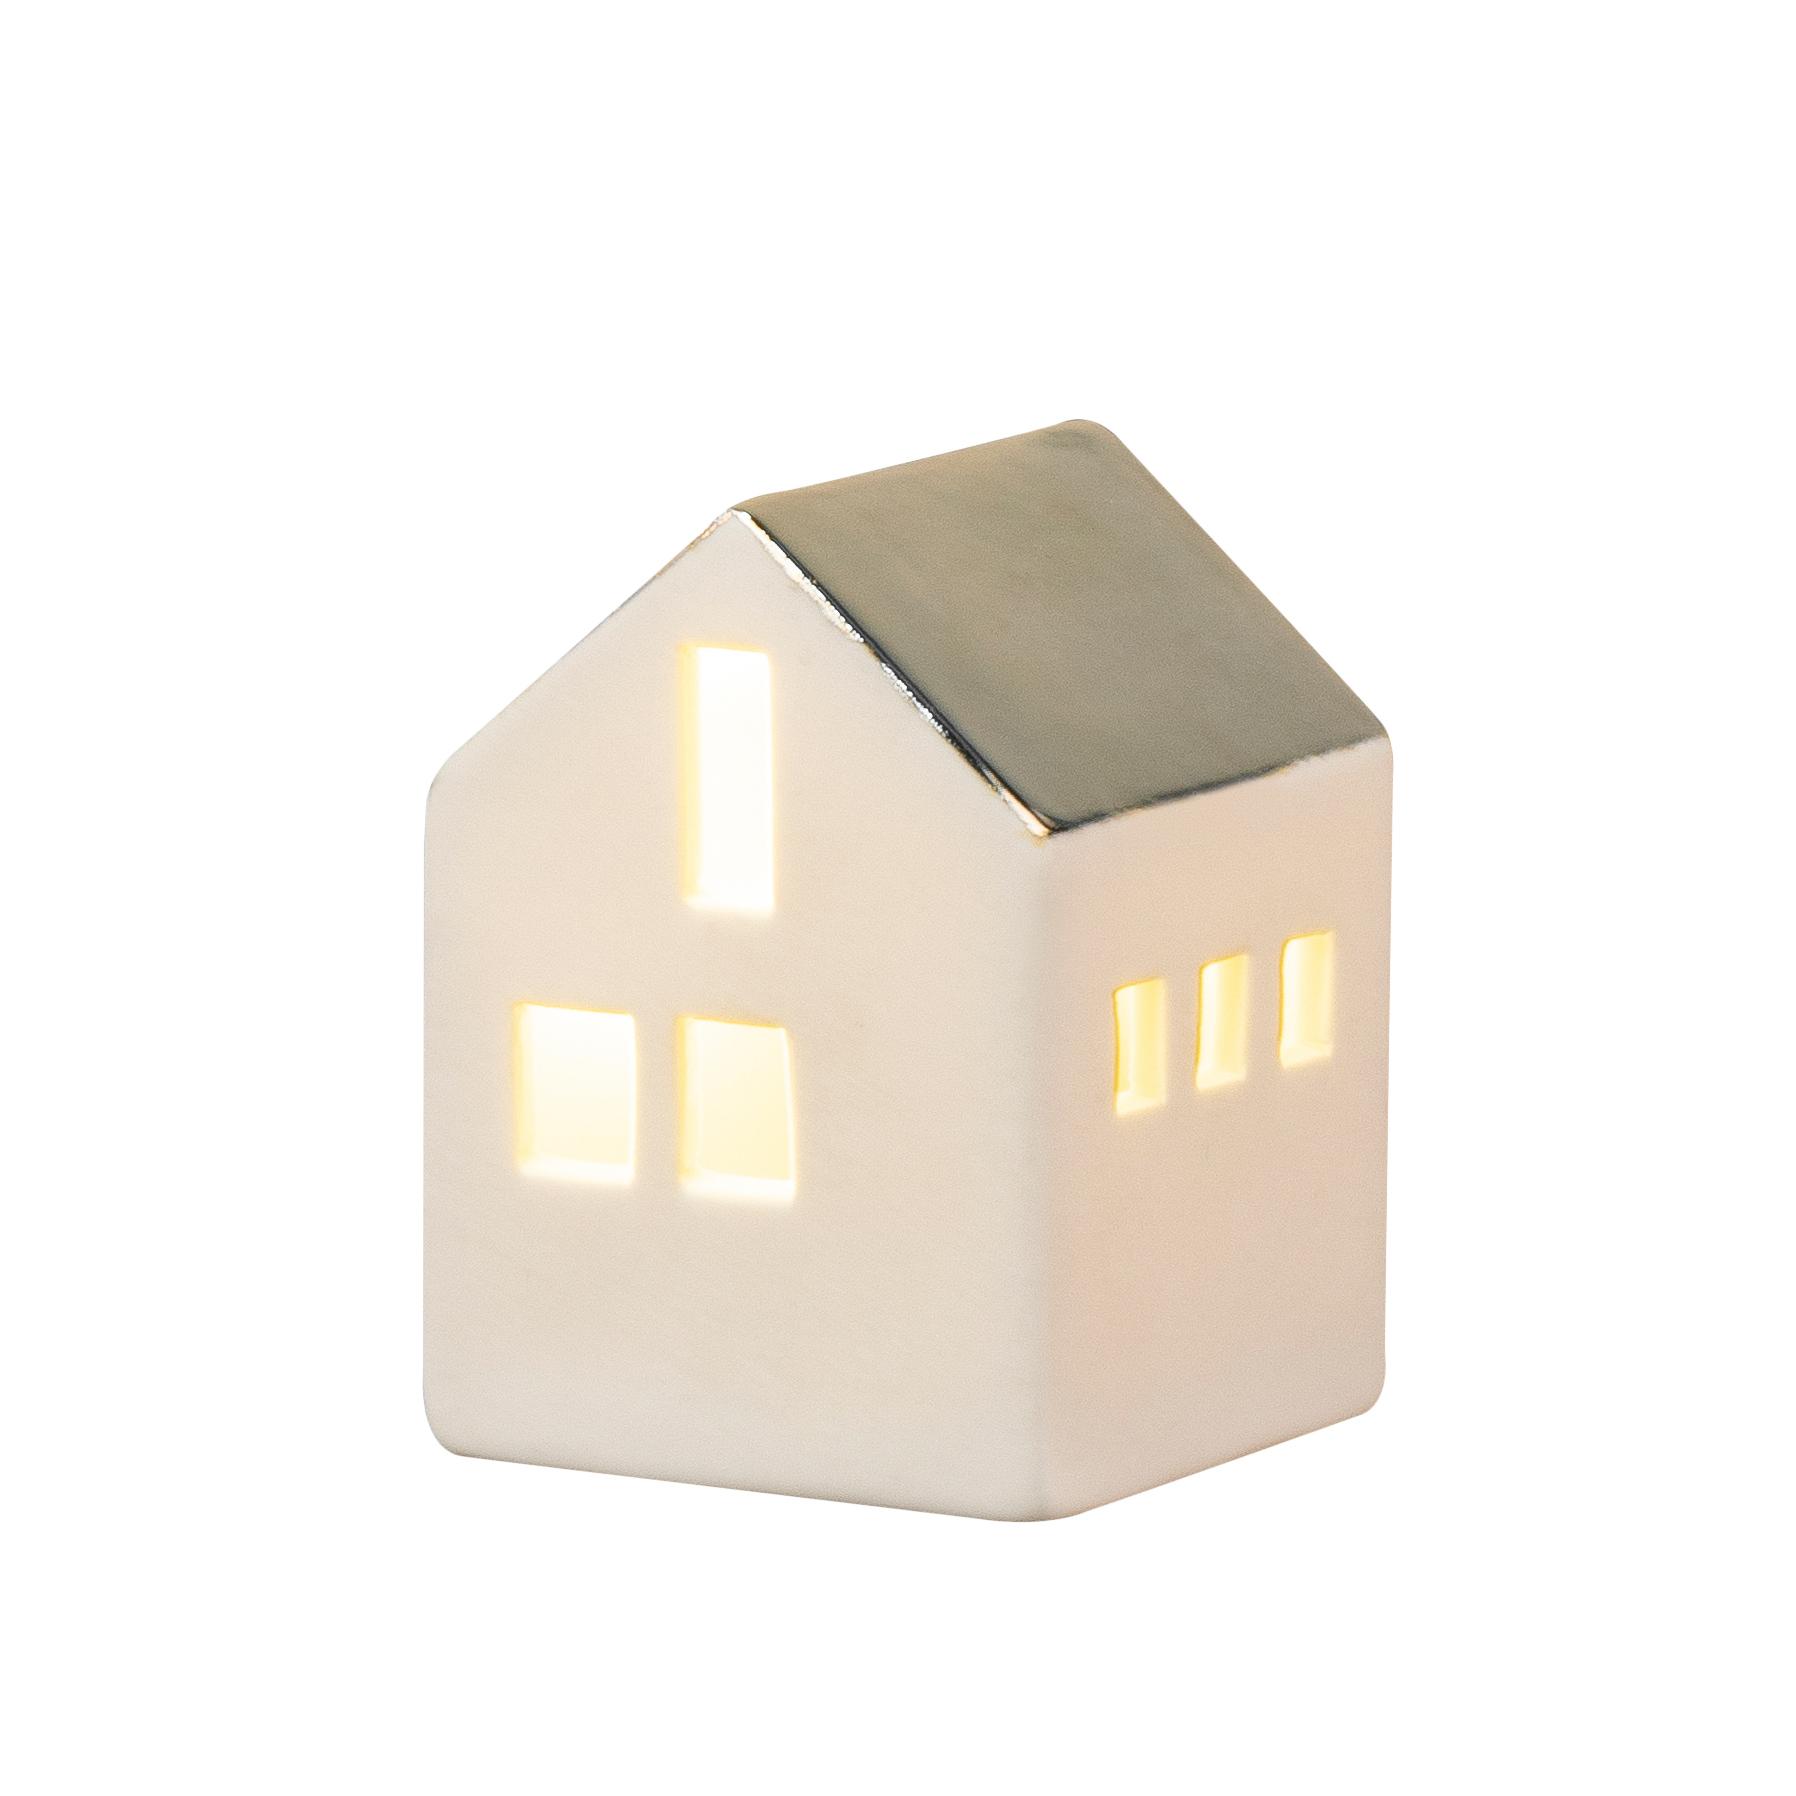 "Mini LED Lichthaus ""groß"" - räder (Xmas)"